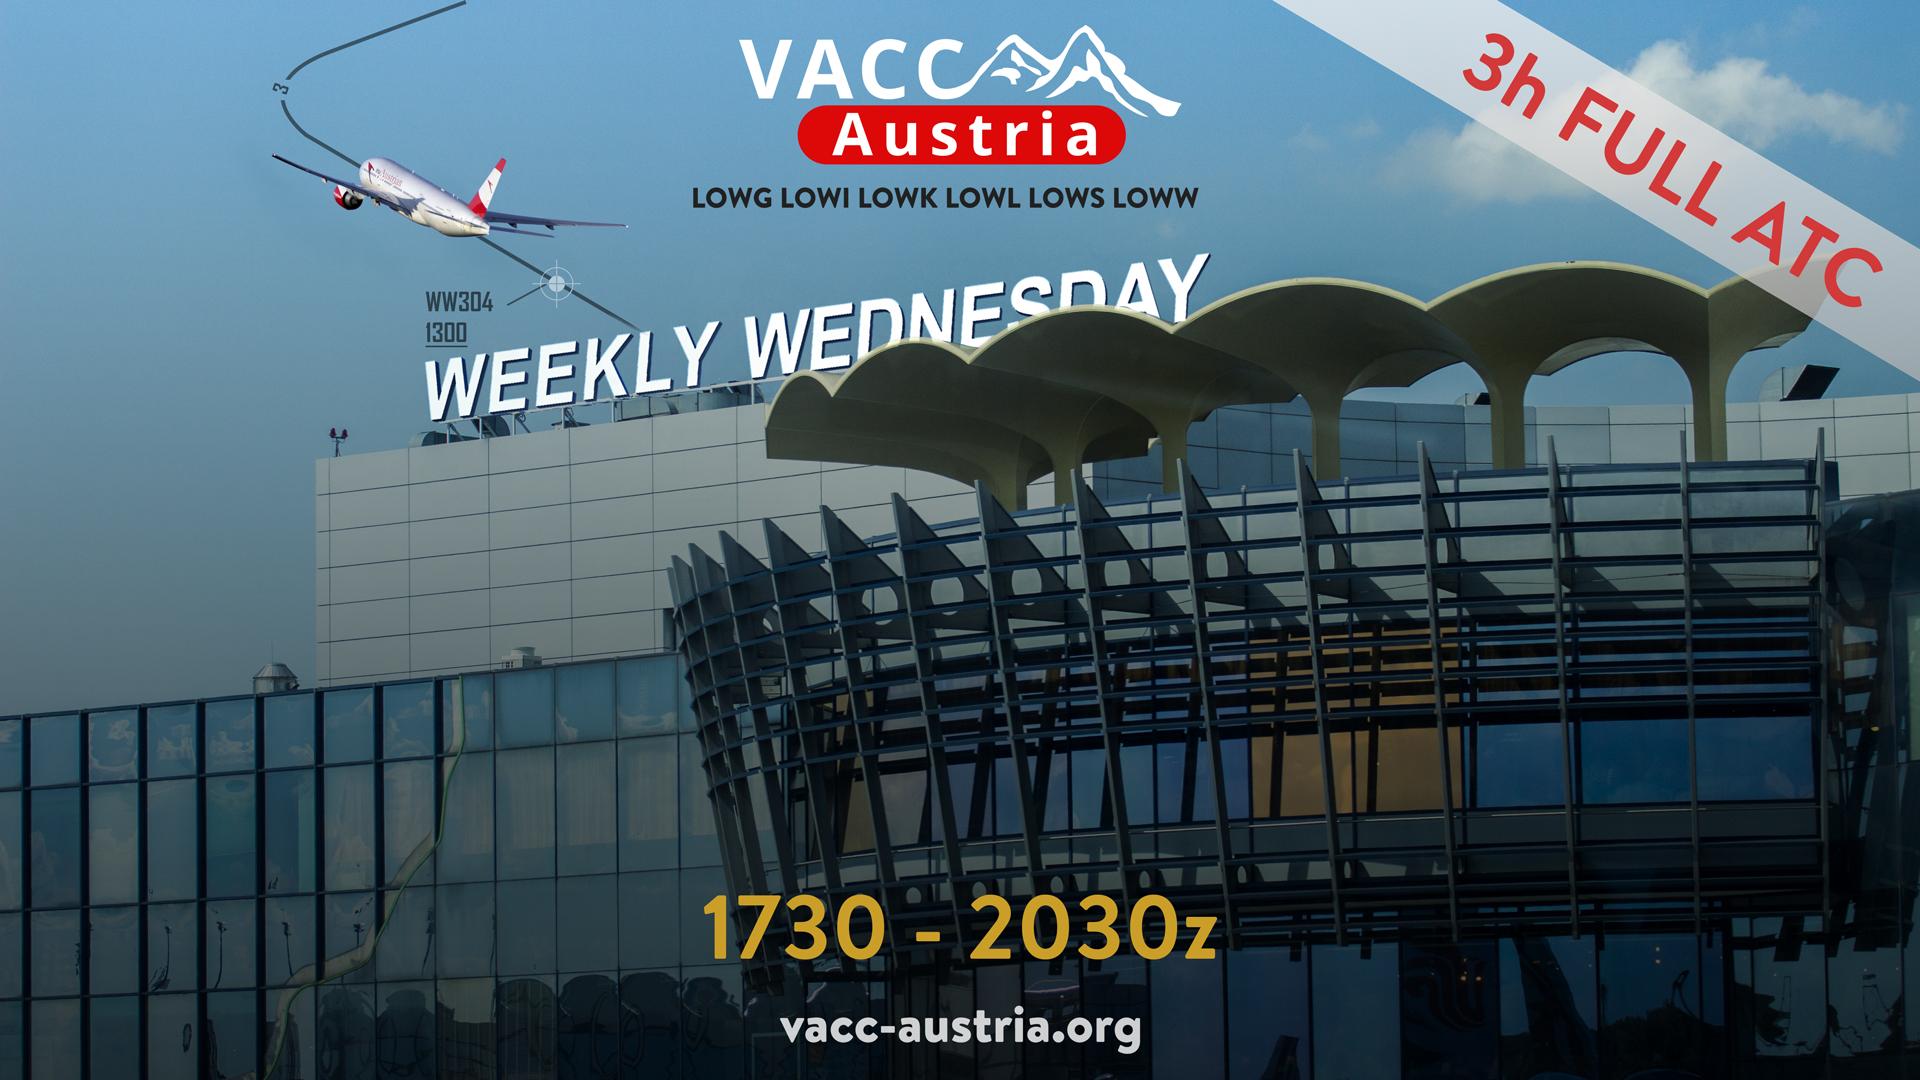 VACC-Austria Weekly Wednesday - Virtual Norwegian Events